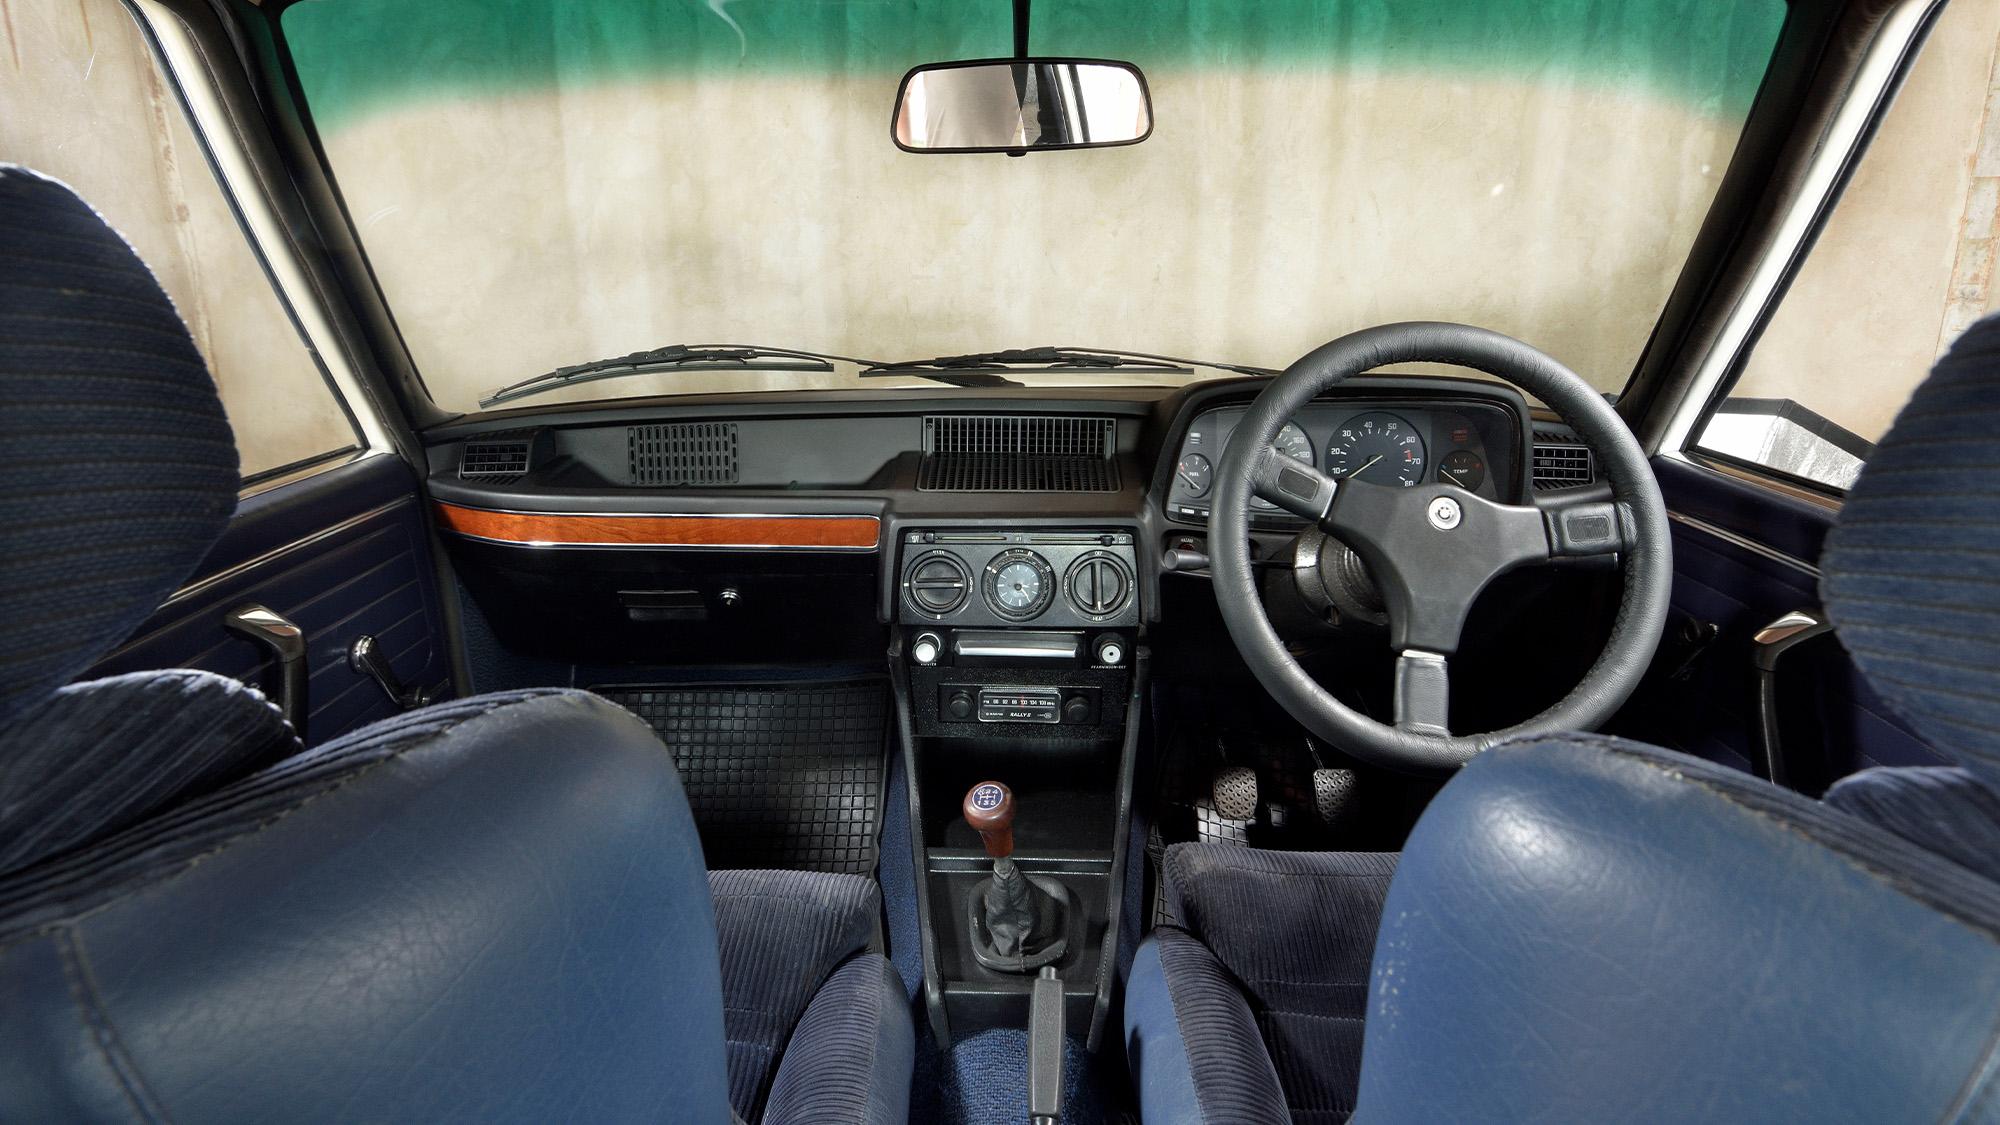 BMW 530 MLE interior